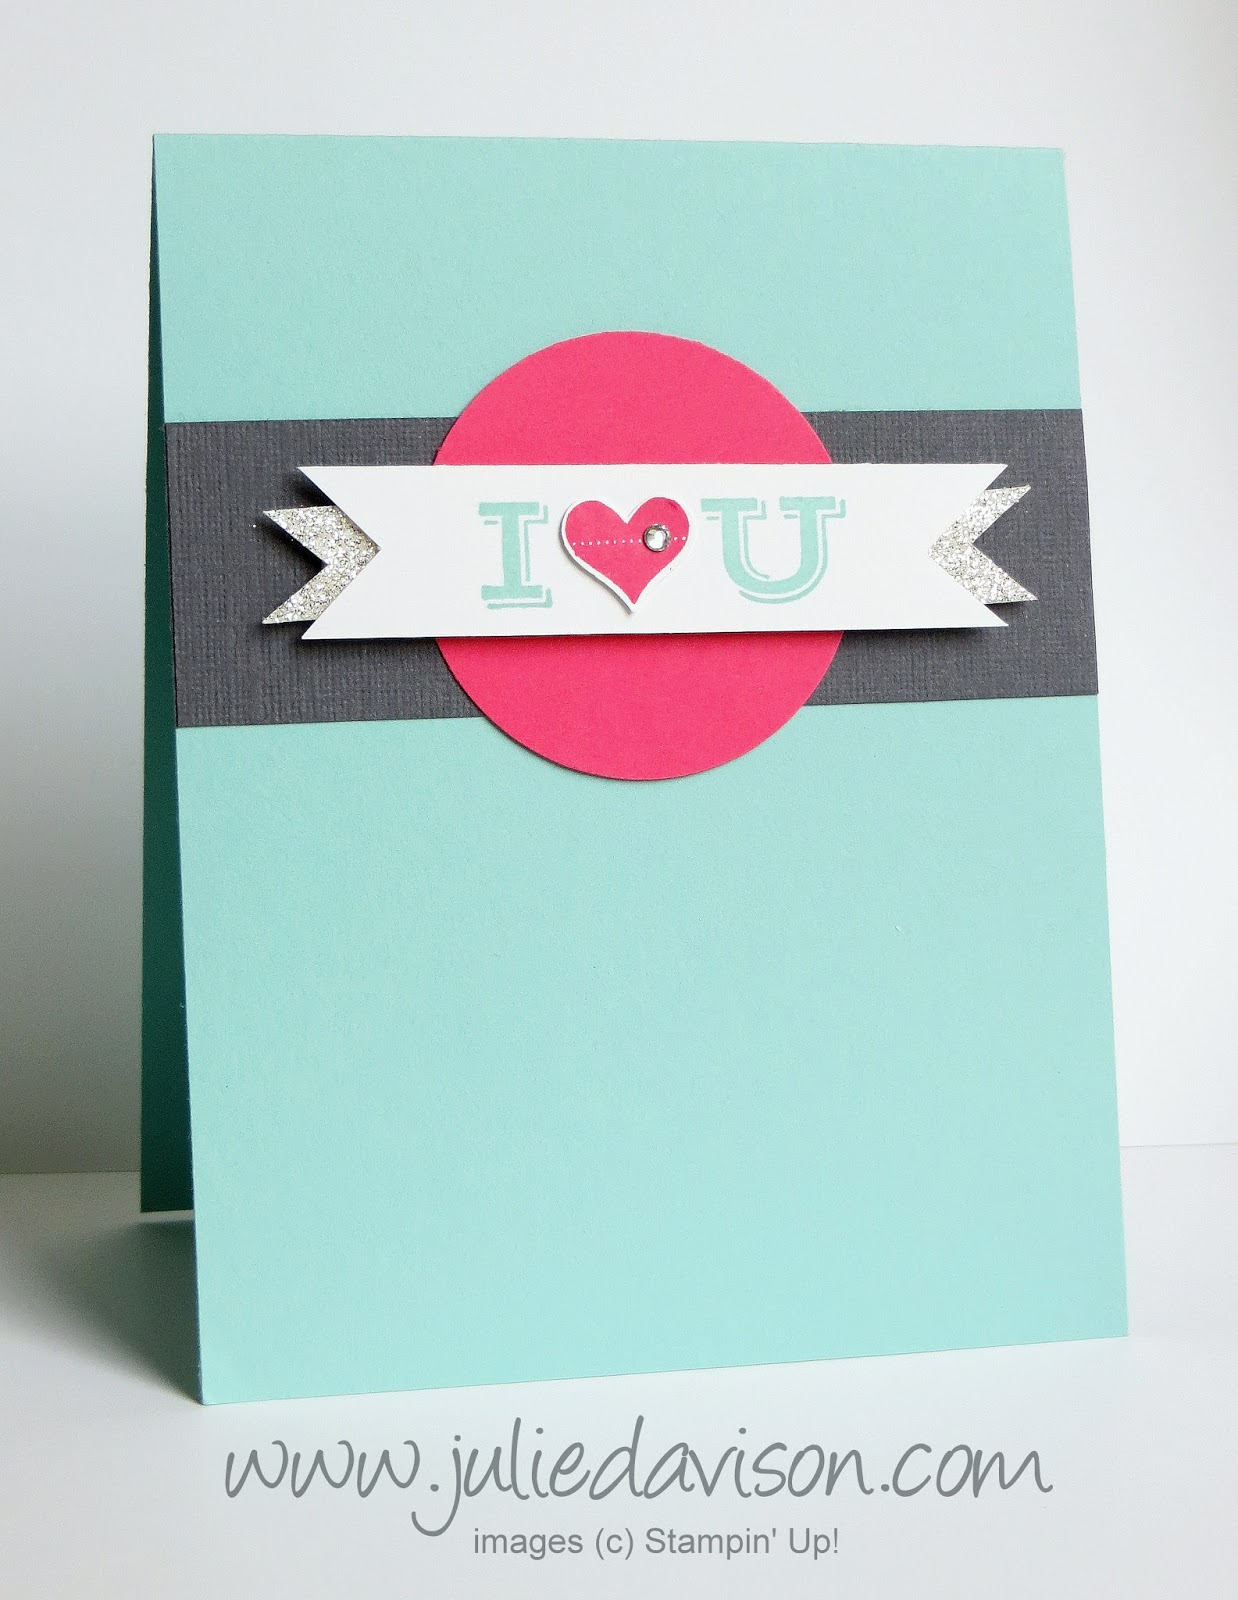 http://juliedavison.blogspot.com/2014/07/aw21-pictogram-punches-love-card-mini.html